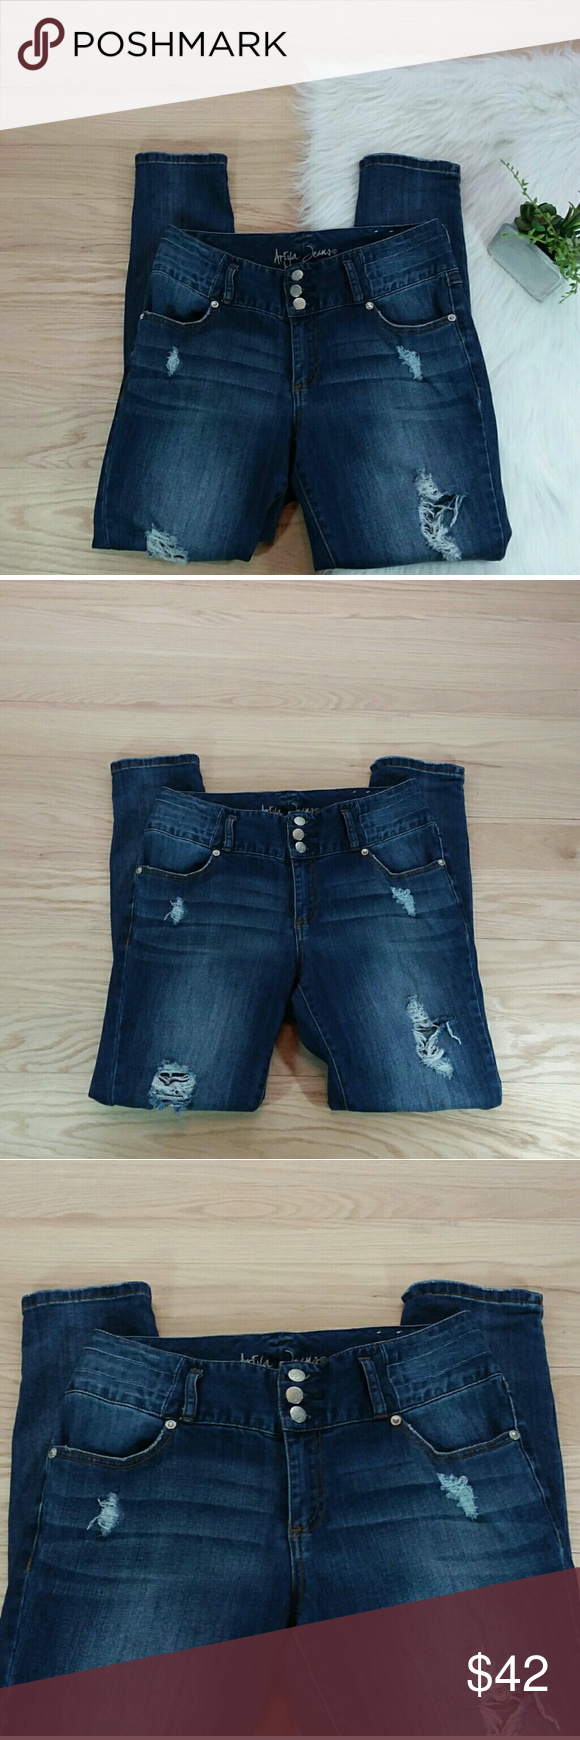 e6c390ff496 Ariya Jeans 9 10 reg Rip Distress High rise Kauai Ariya Jeans Size 9 10  regular Jeans Measurements Waist 16